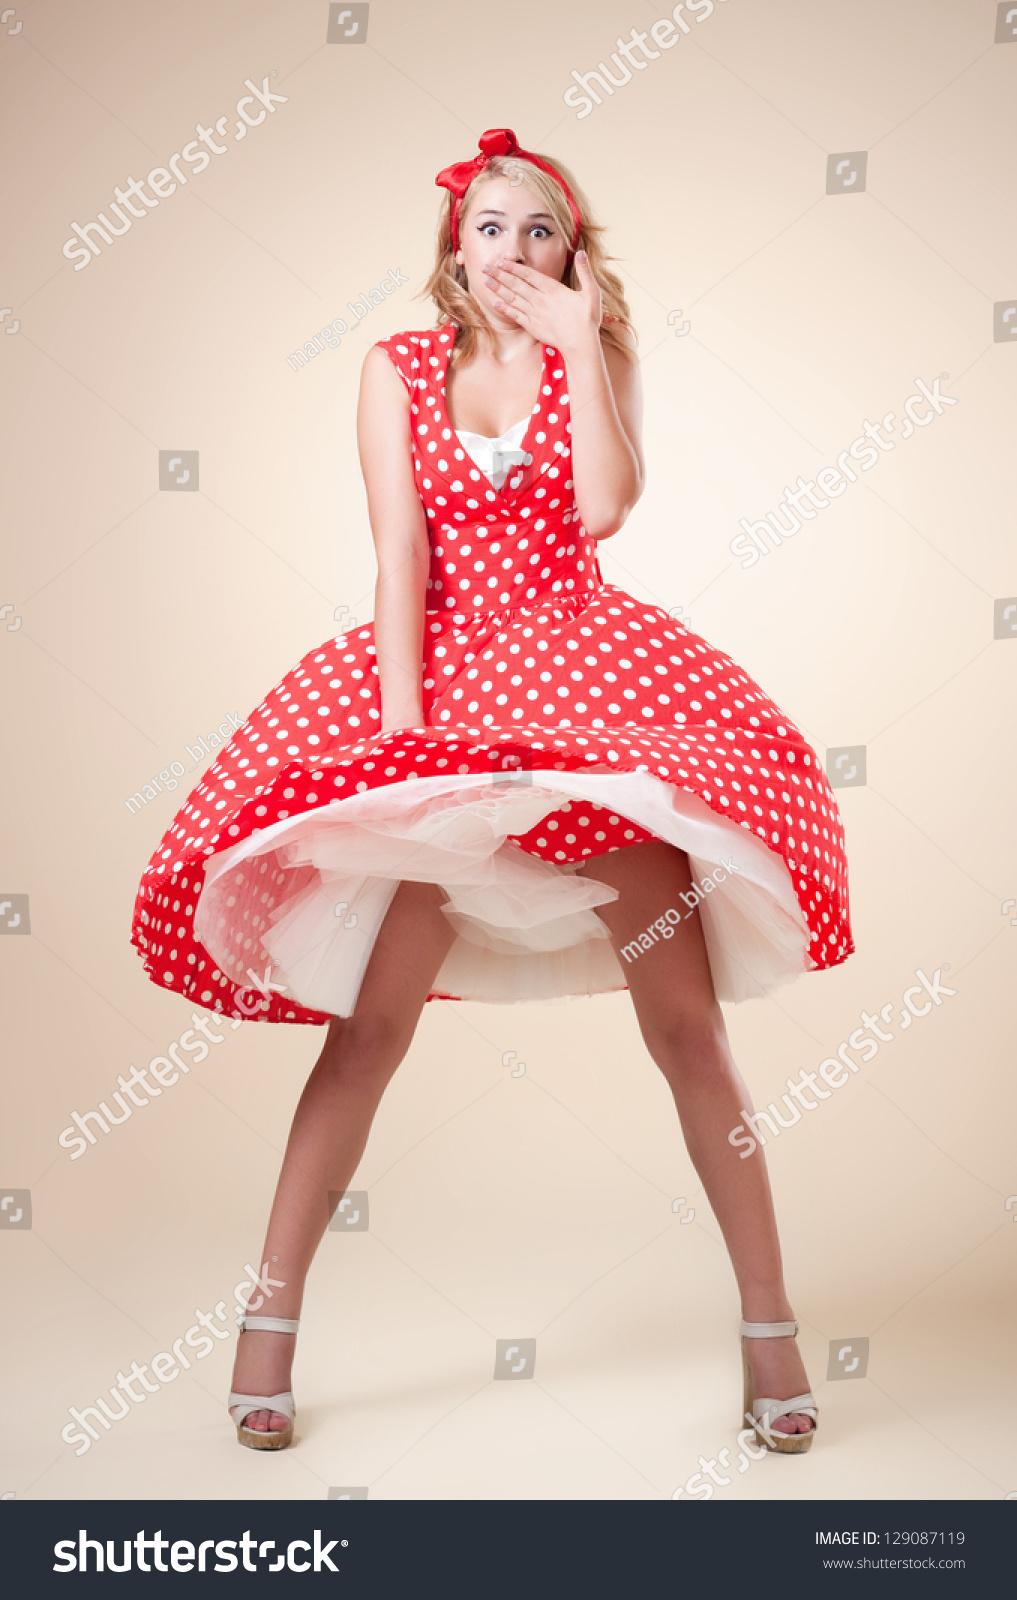 beautiful young girl retro pinup style imagen de archivo stock 129087119 shutterstock. Black Bedroom Furniture Sets. Home Design Ideas